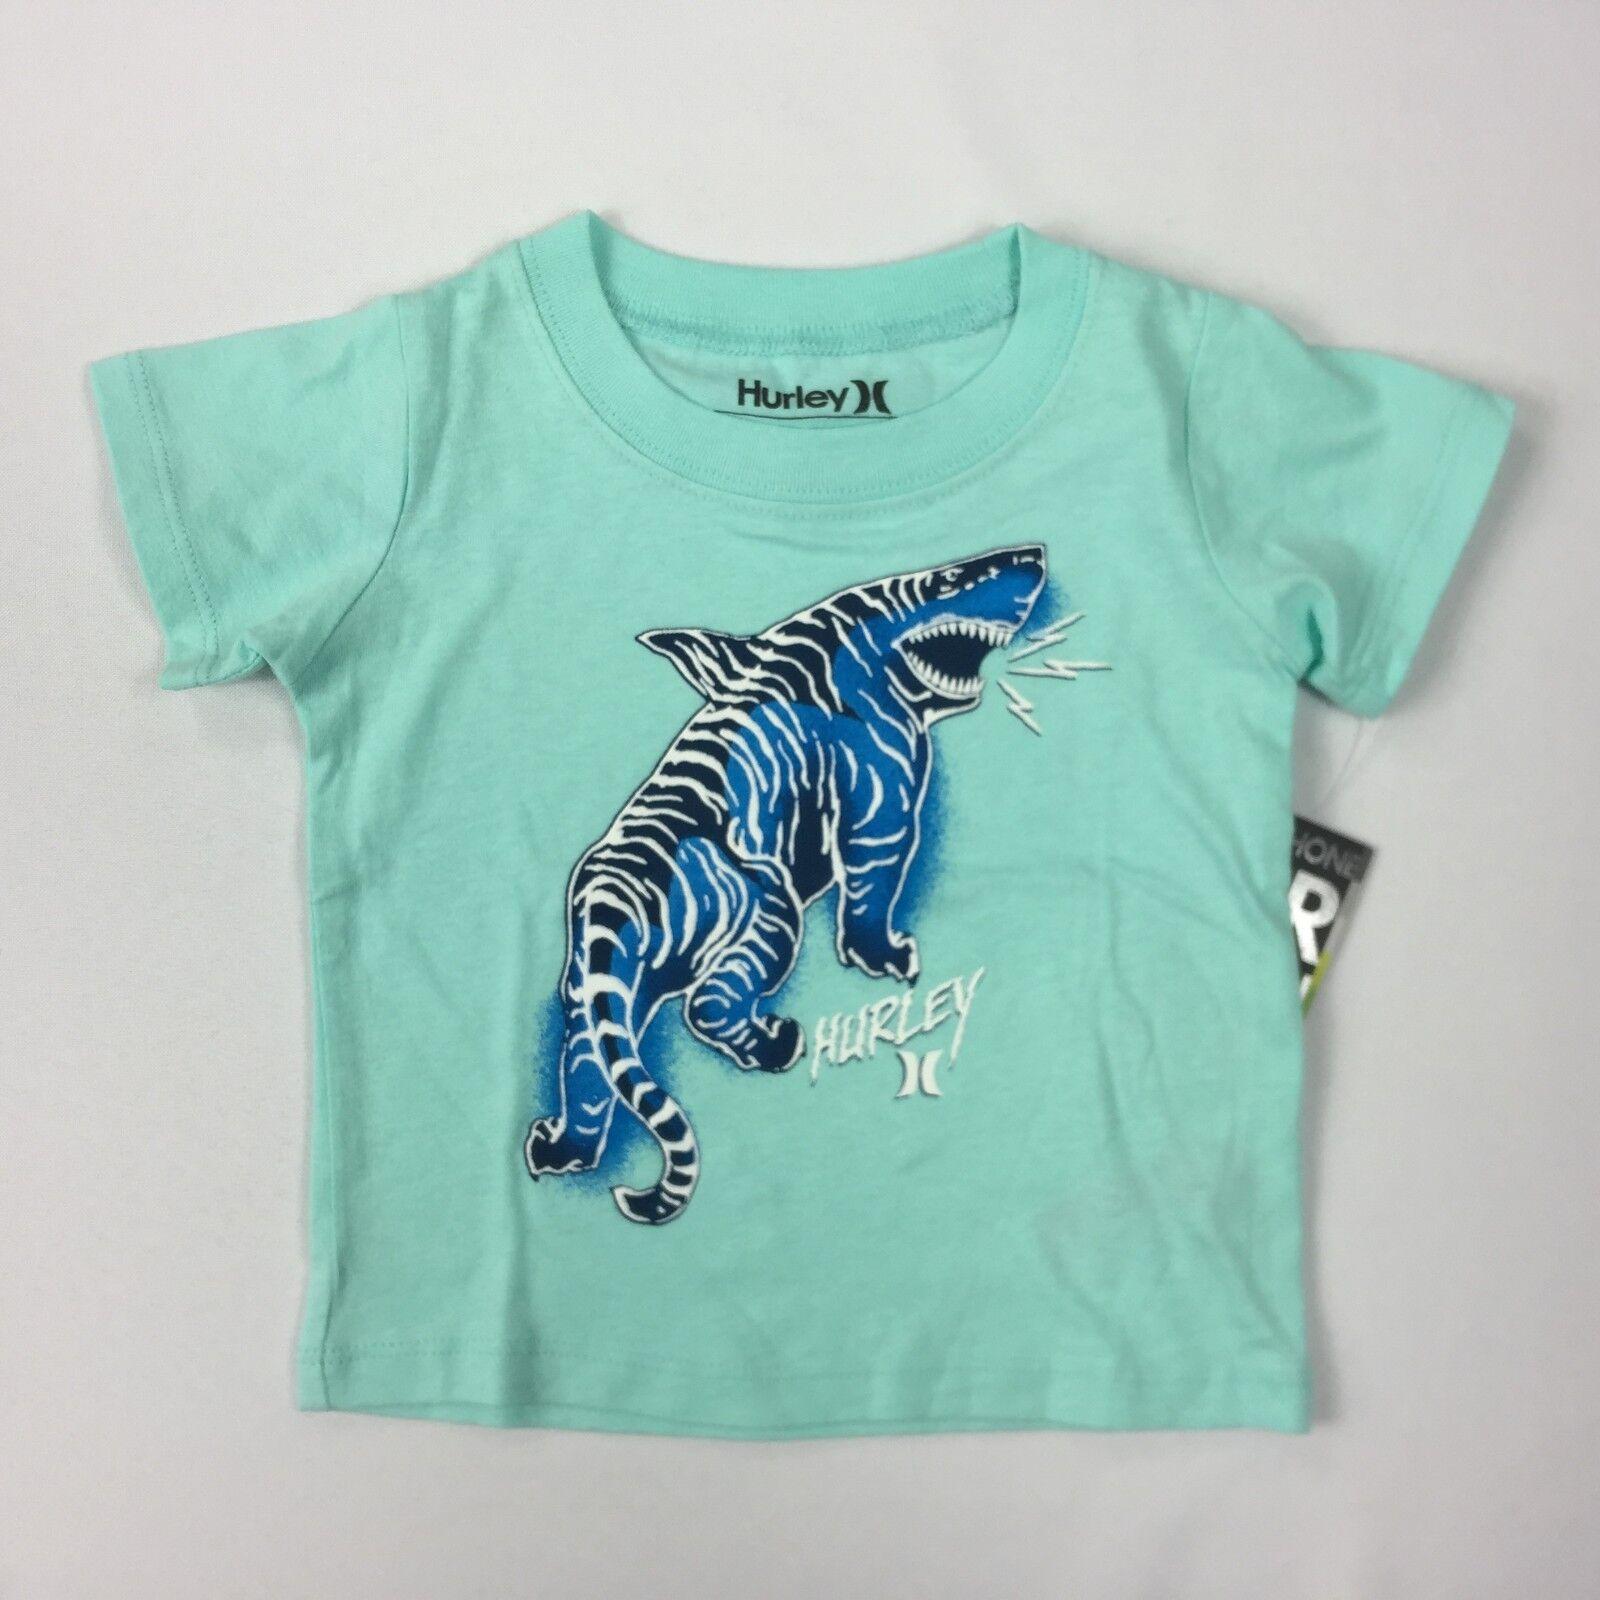 Baby Boy Hurley T shirt MINT Tiger Shark 24 M